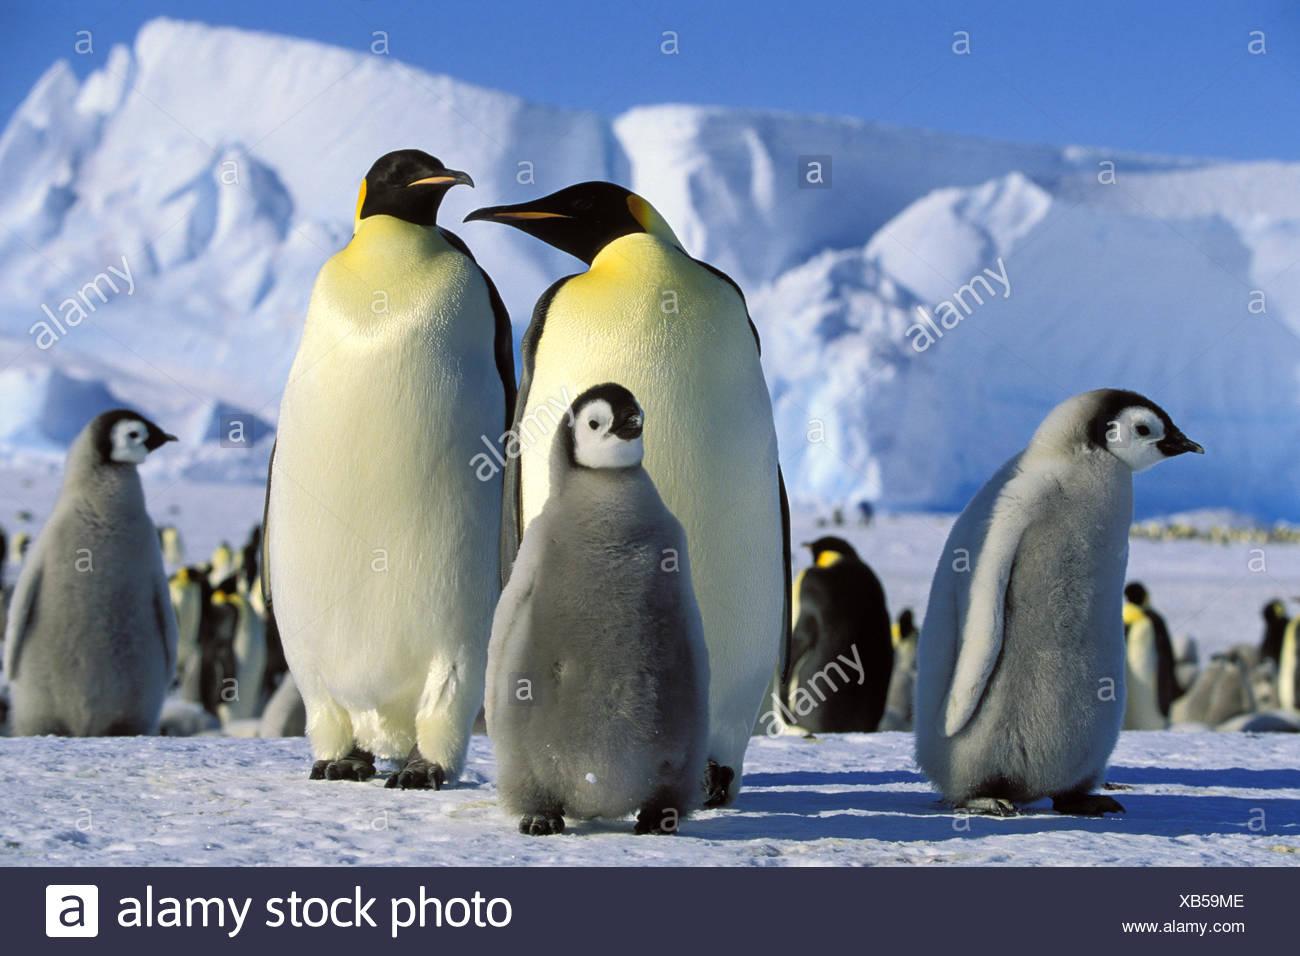 Emperor penguin (Aptenodytes forsteri), Emperor Penguins with chicks, Antarctica - Stock Image